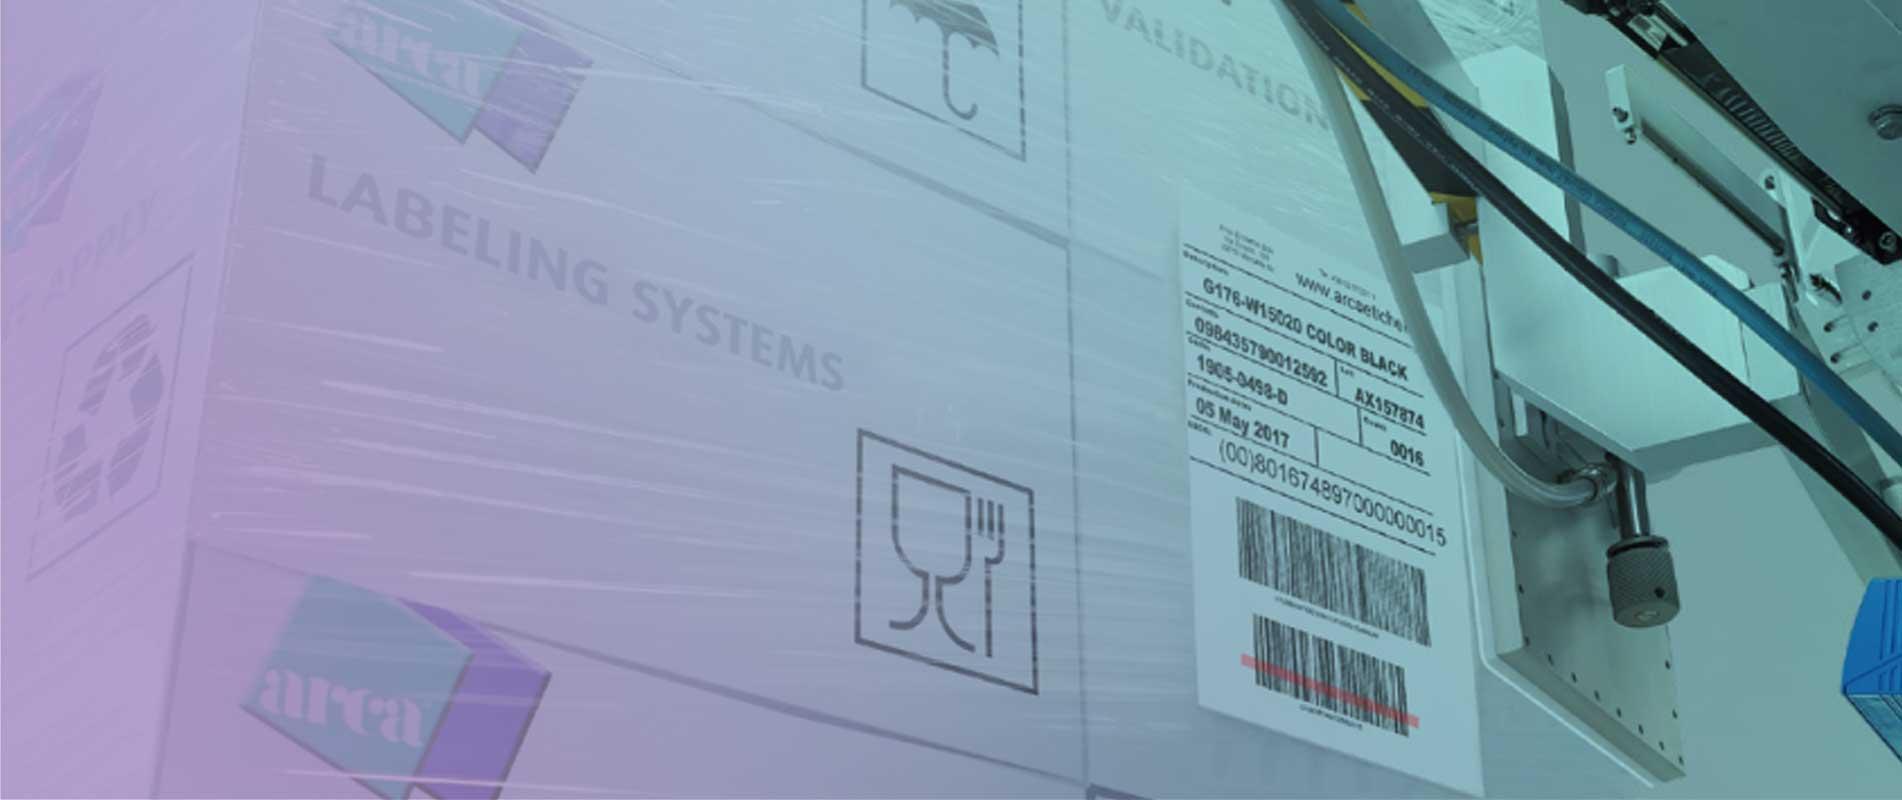 header barcode 02 - ЭТИКЕТИРОВОЧНАЯ СИСТЕМА PHARMA SEAL 4.0